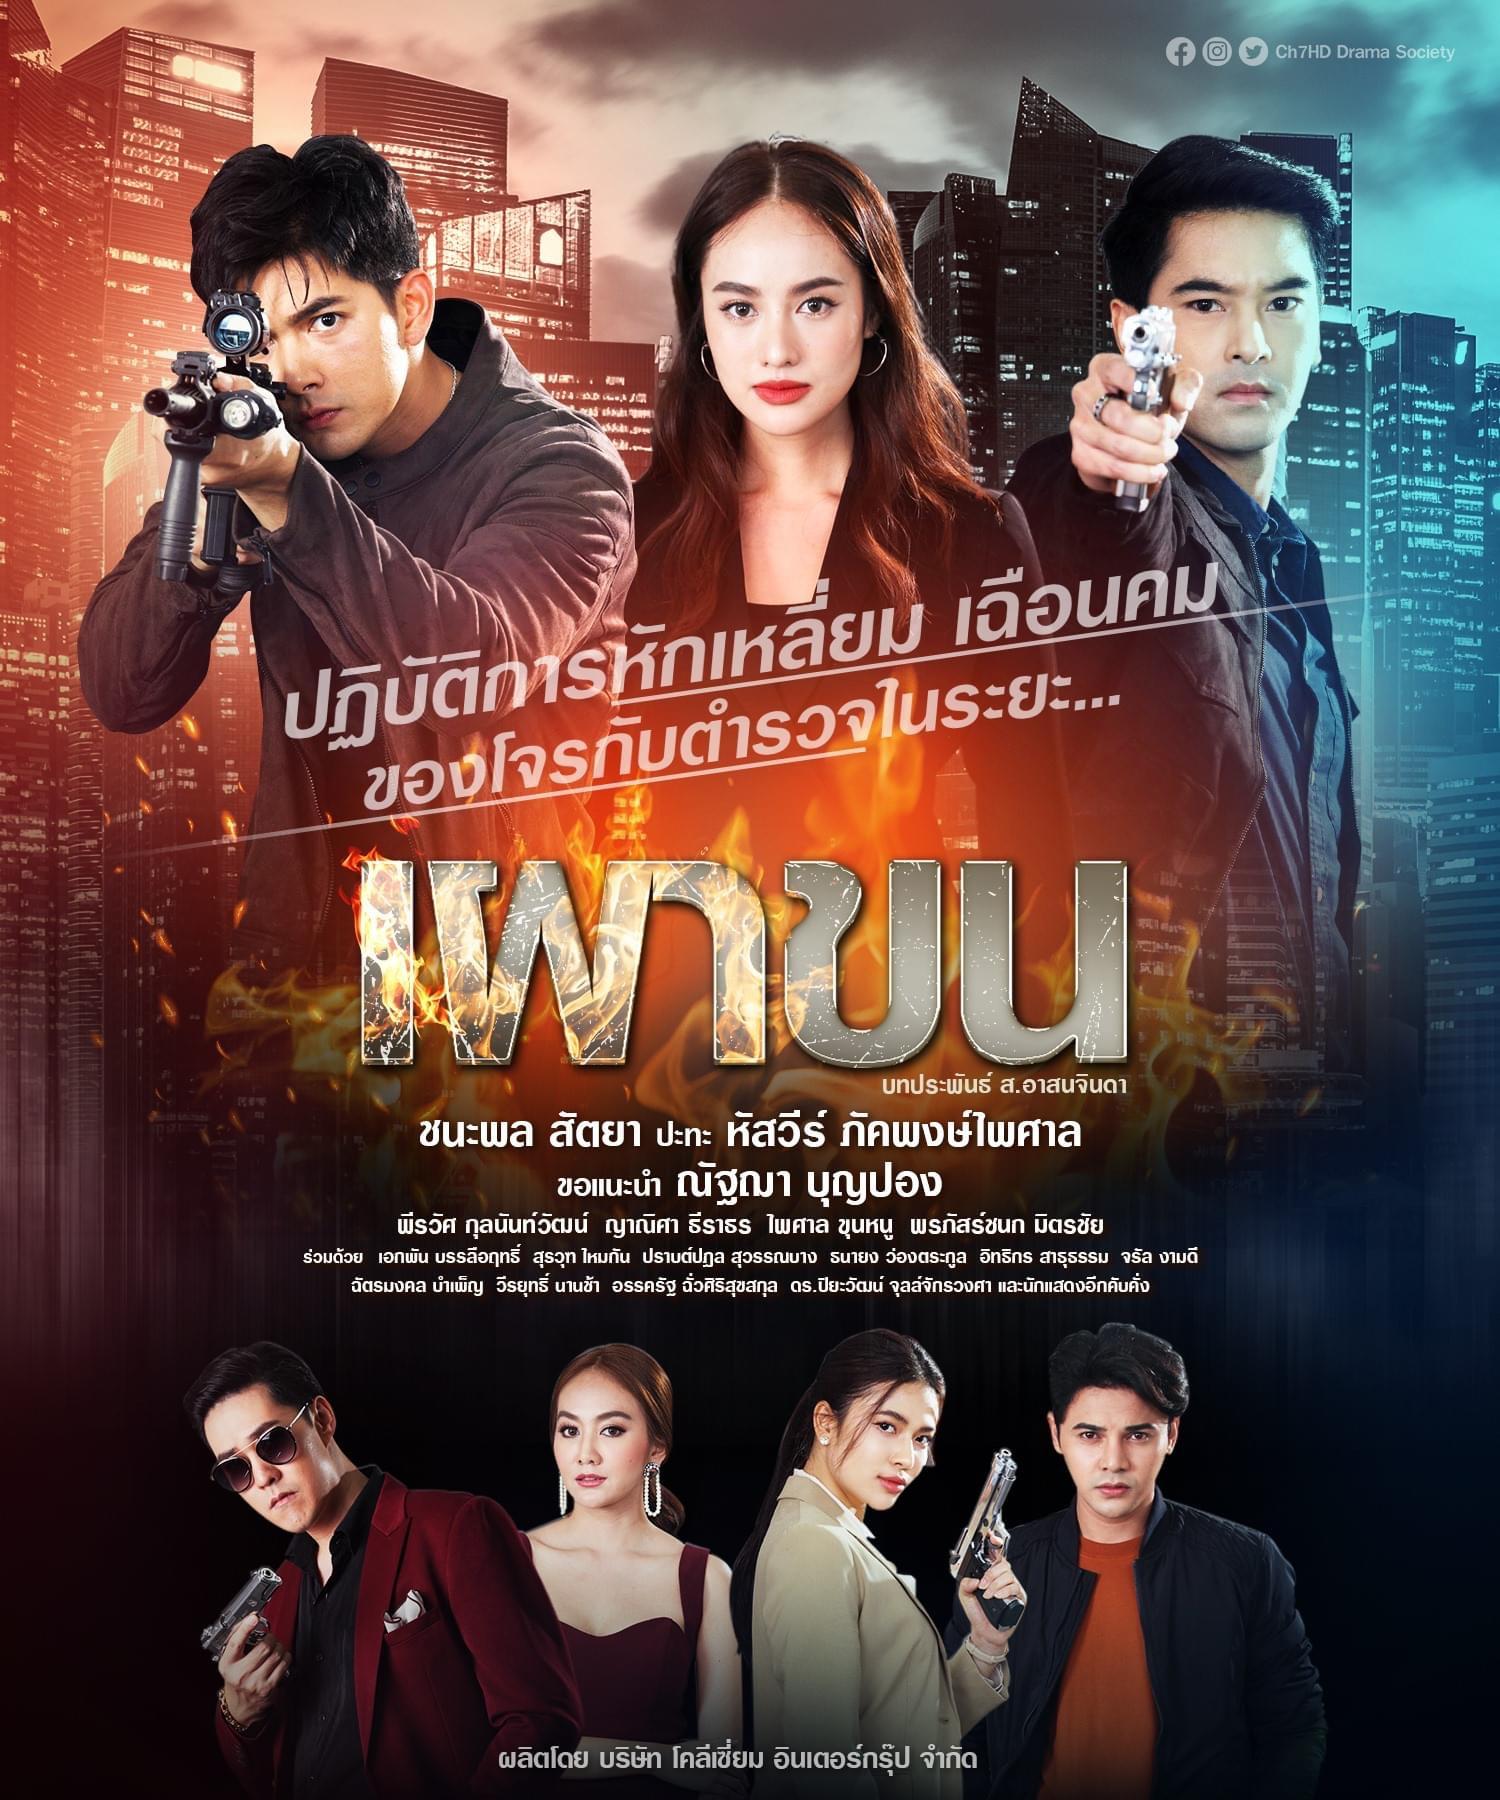 Phao Khon (2021) / Laydown and Fire